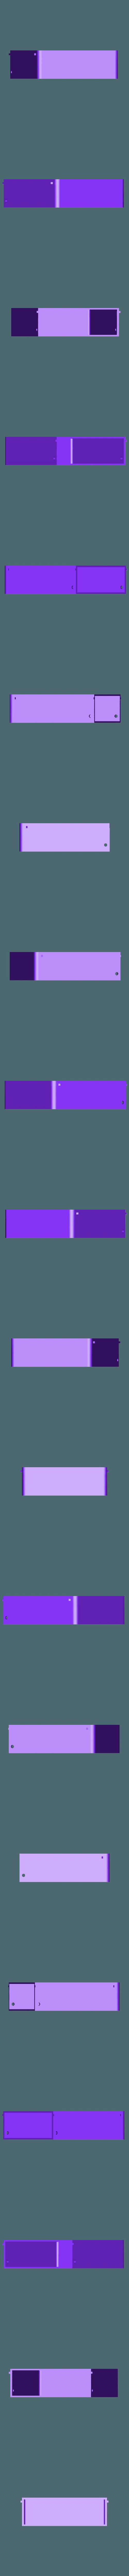 Fan_Housing.STL Download free STL file DIY Solder Fume extractor with variable power • 3D printable model, ellisdrake21